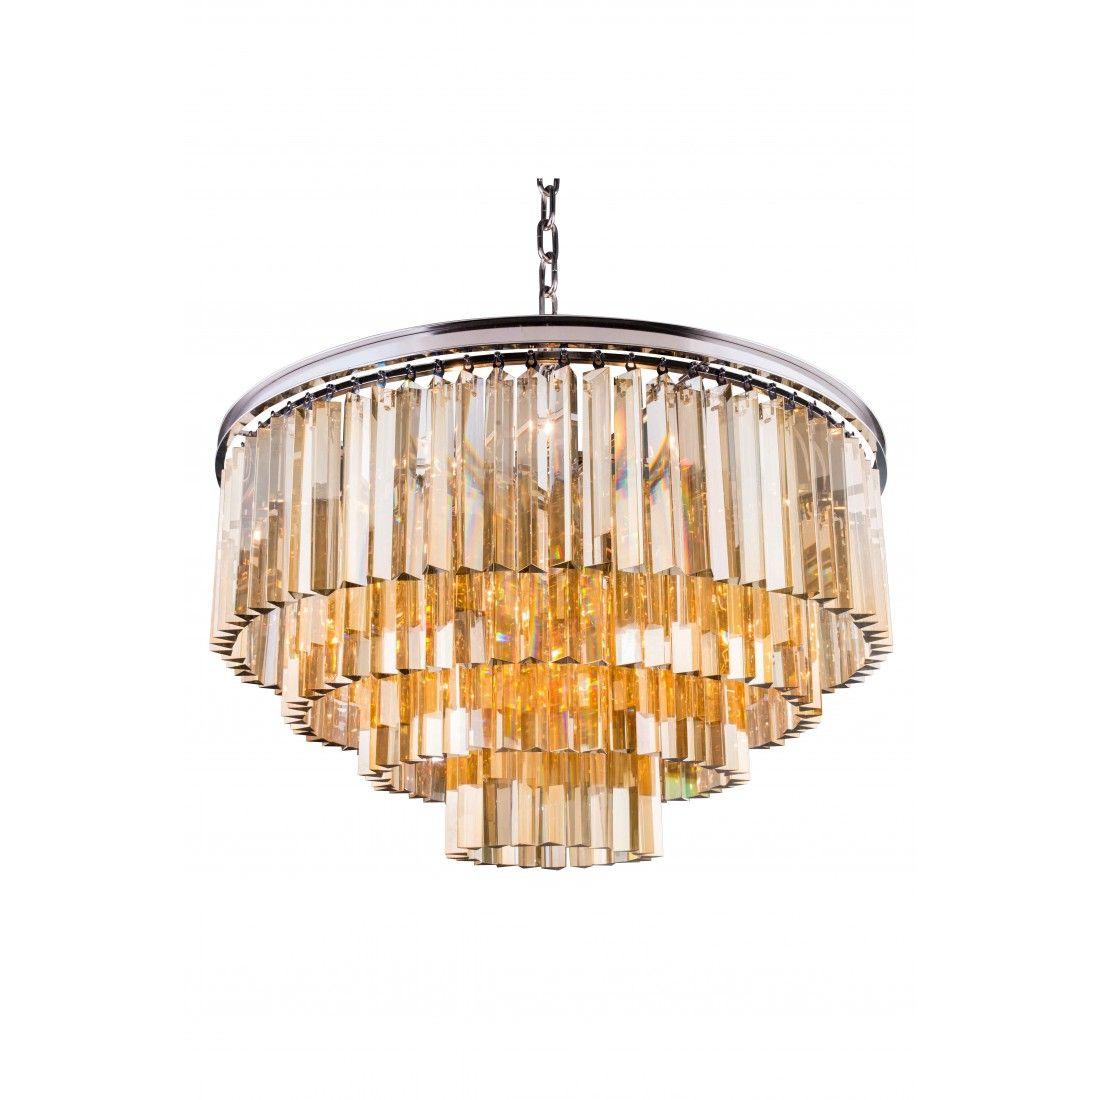 1201 Sydney Collection Pendent Lamp Polished Nickel Finish- Golden Teak